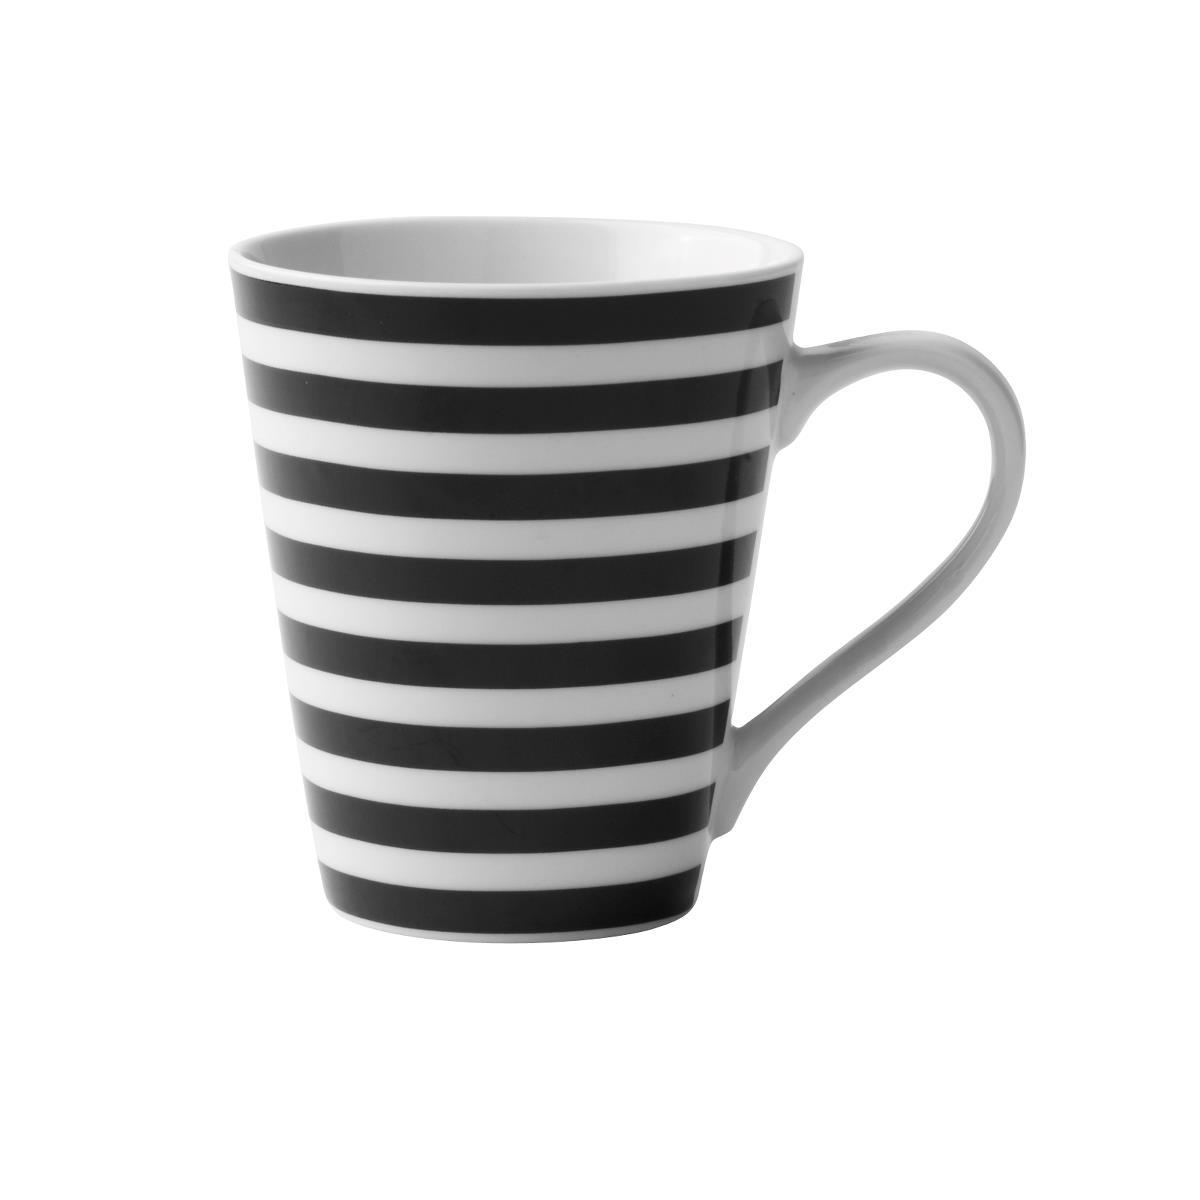 Cana KJ, Black / White, 300 ml, 232201 poza